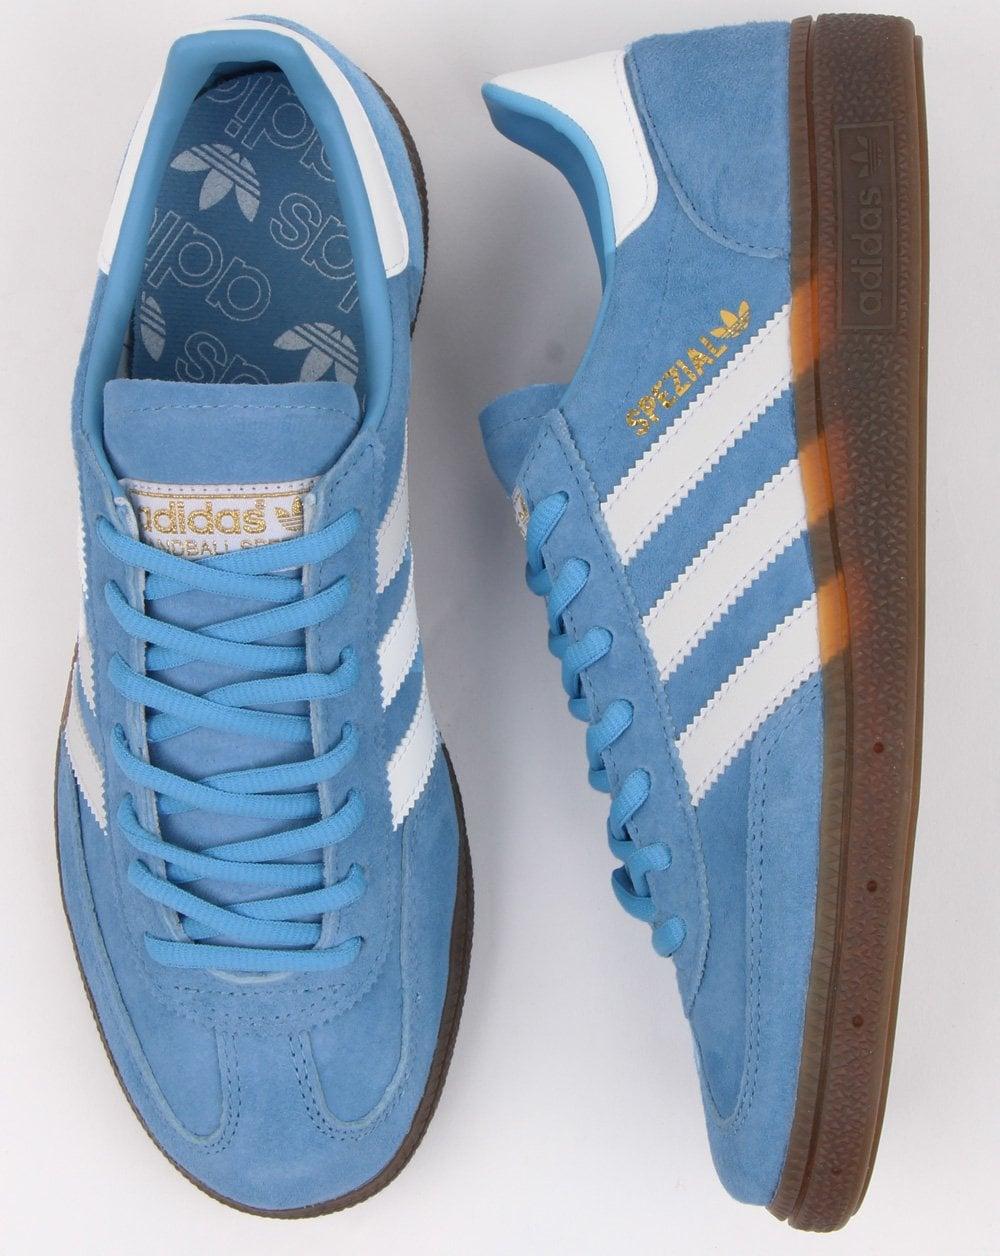 Adidas Spezial Trainers Sky Blue/white